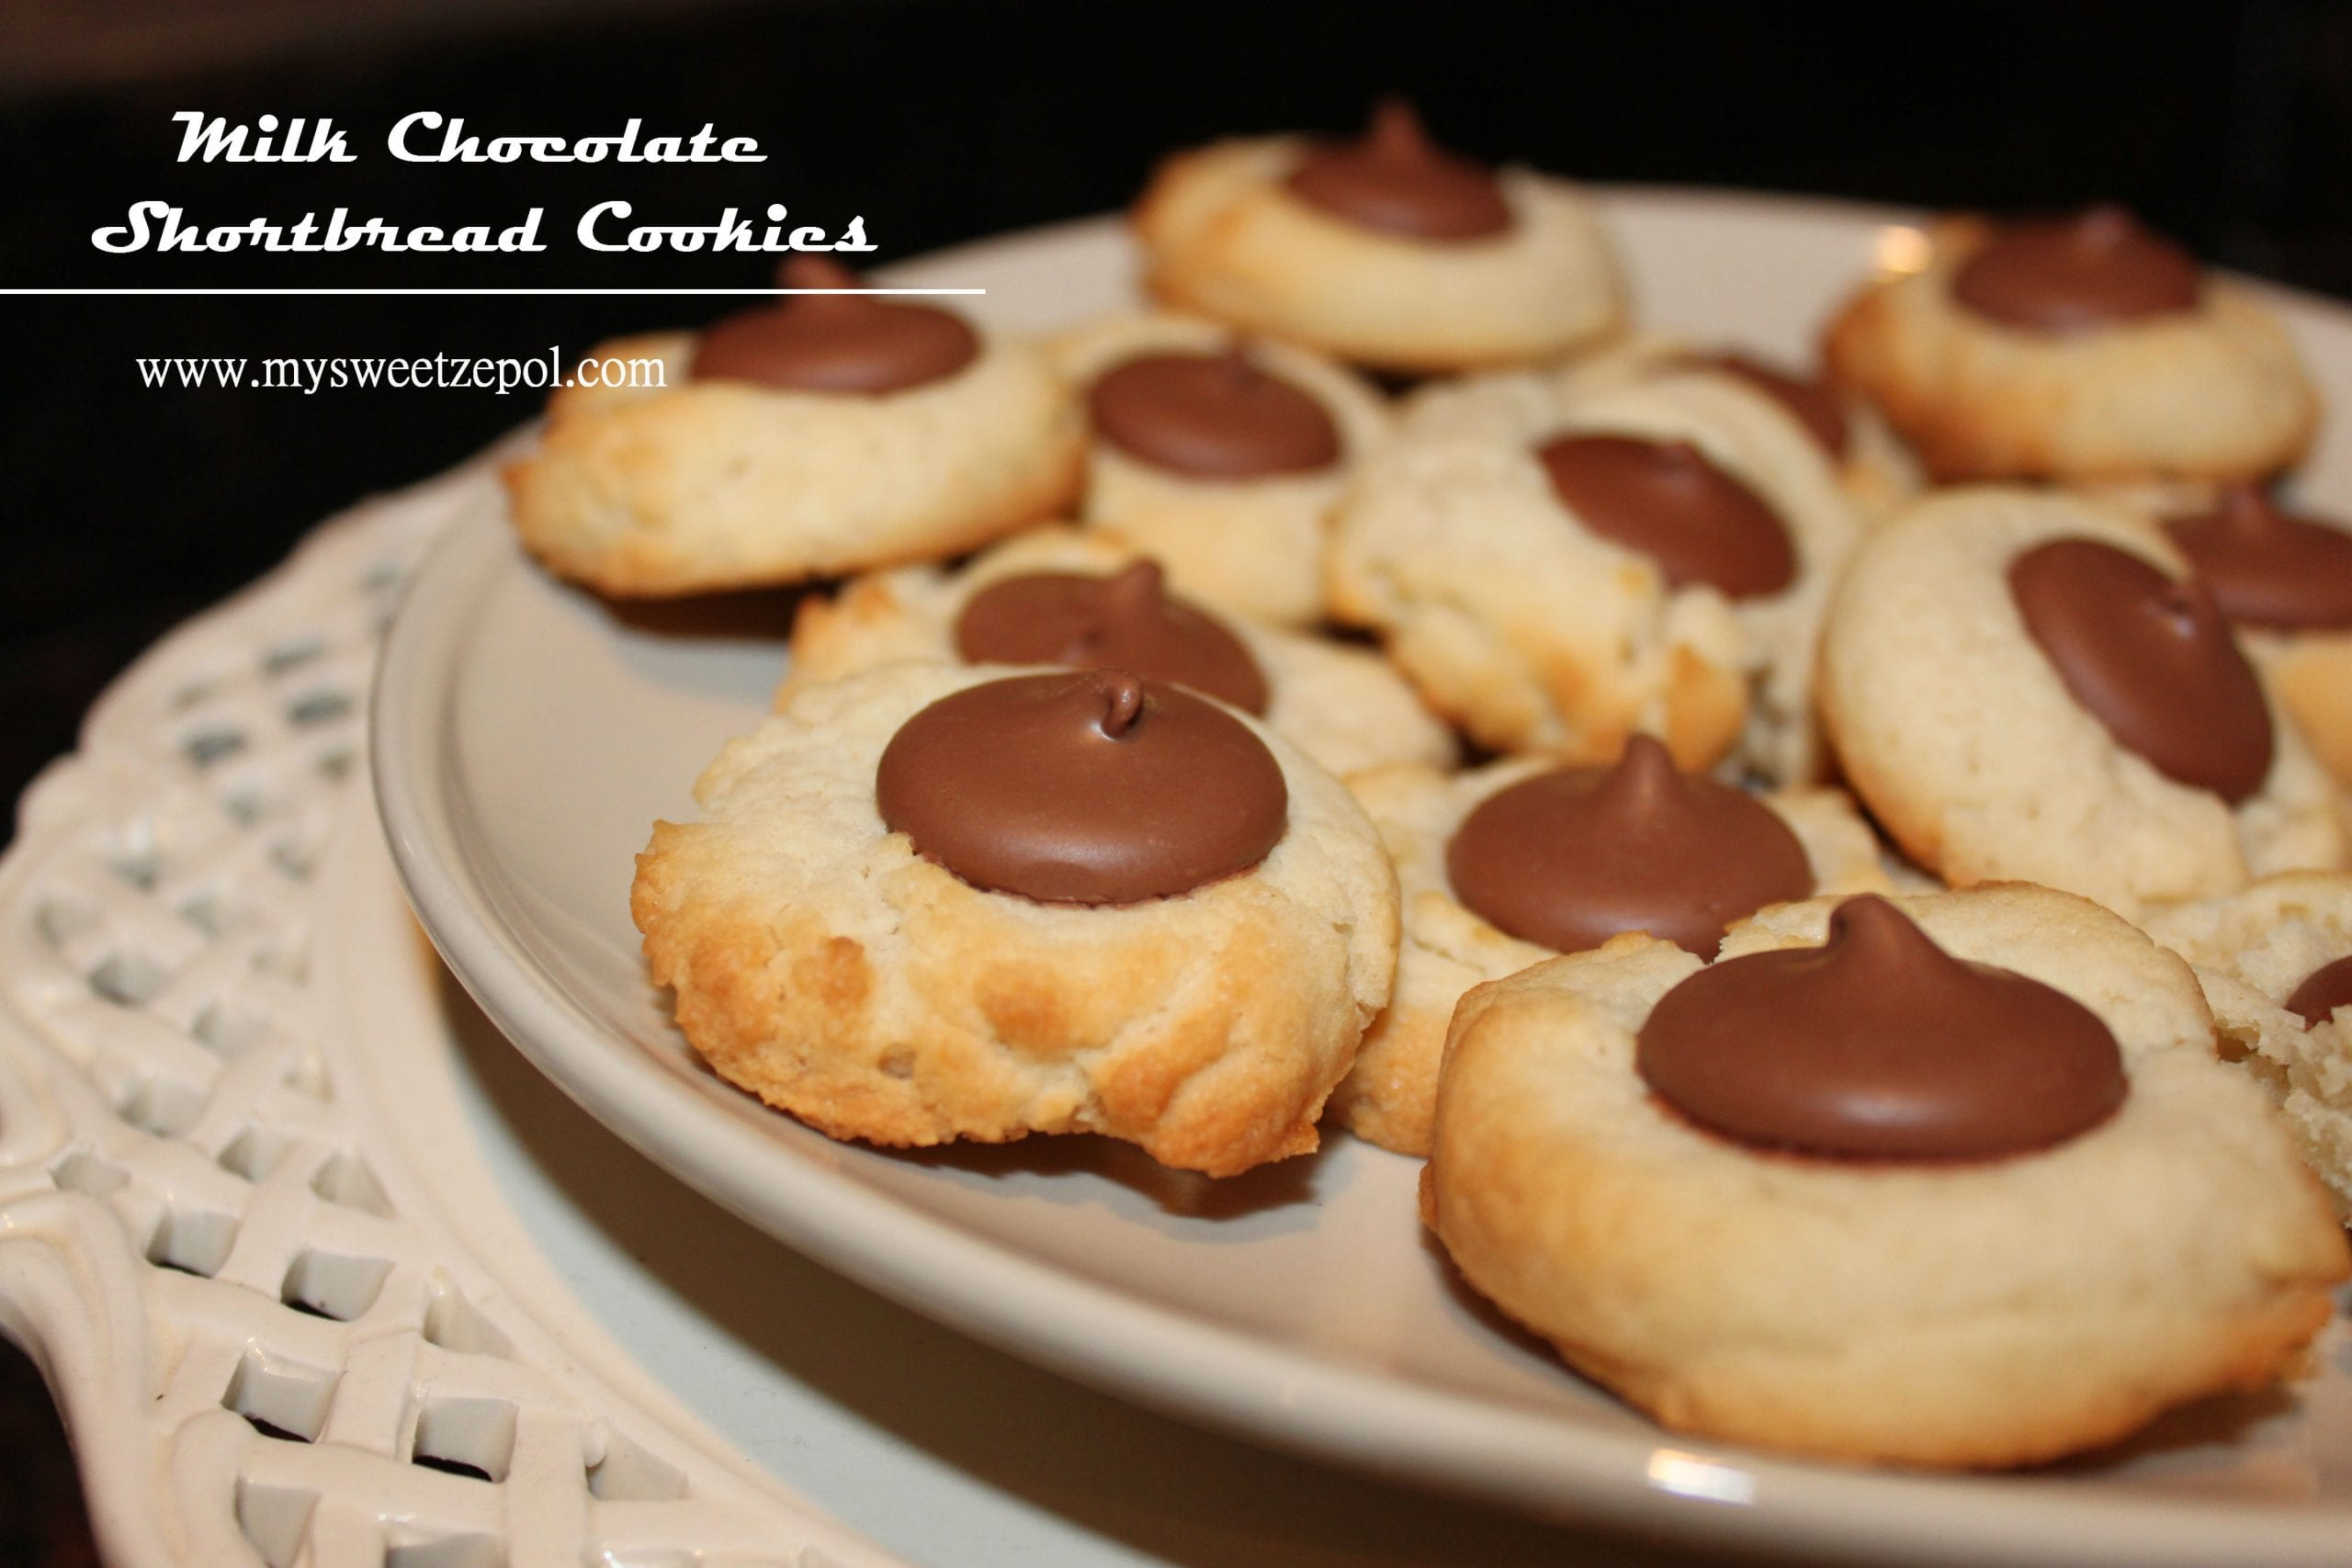 My Sweet Zepol » Milk Chocolate Shortbread Cookies